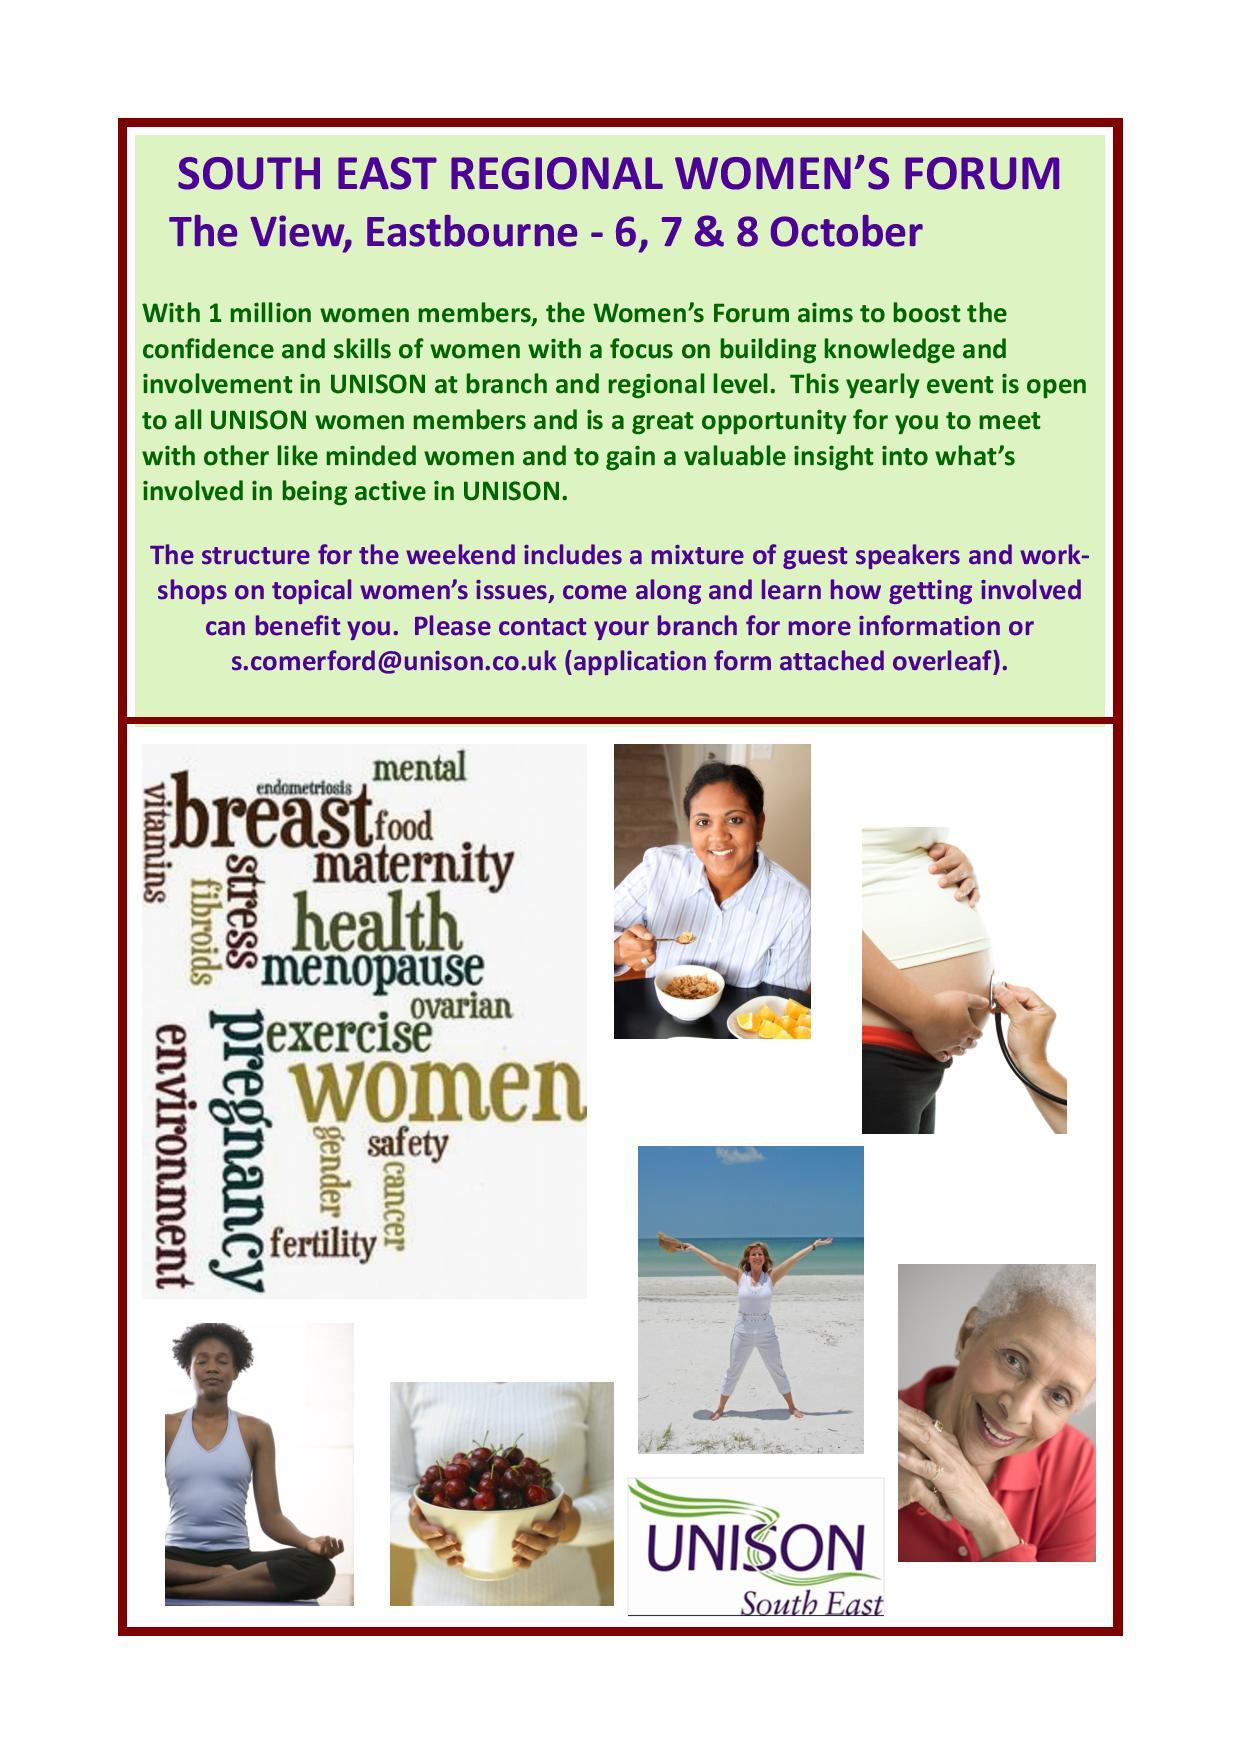 2017_Regional_Women_Forum_flyer_Provisional-page-001.jpg